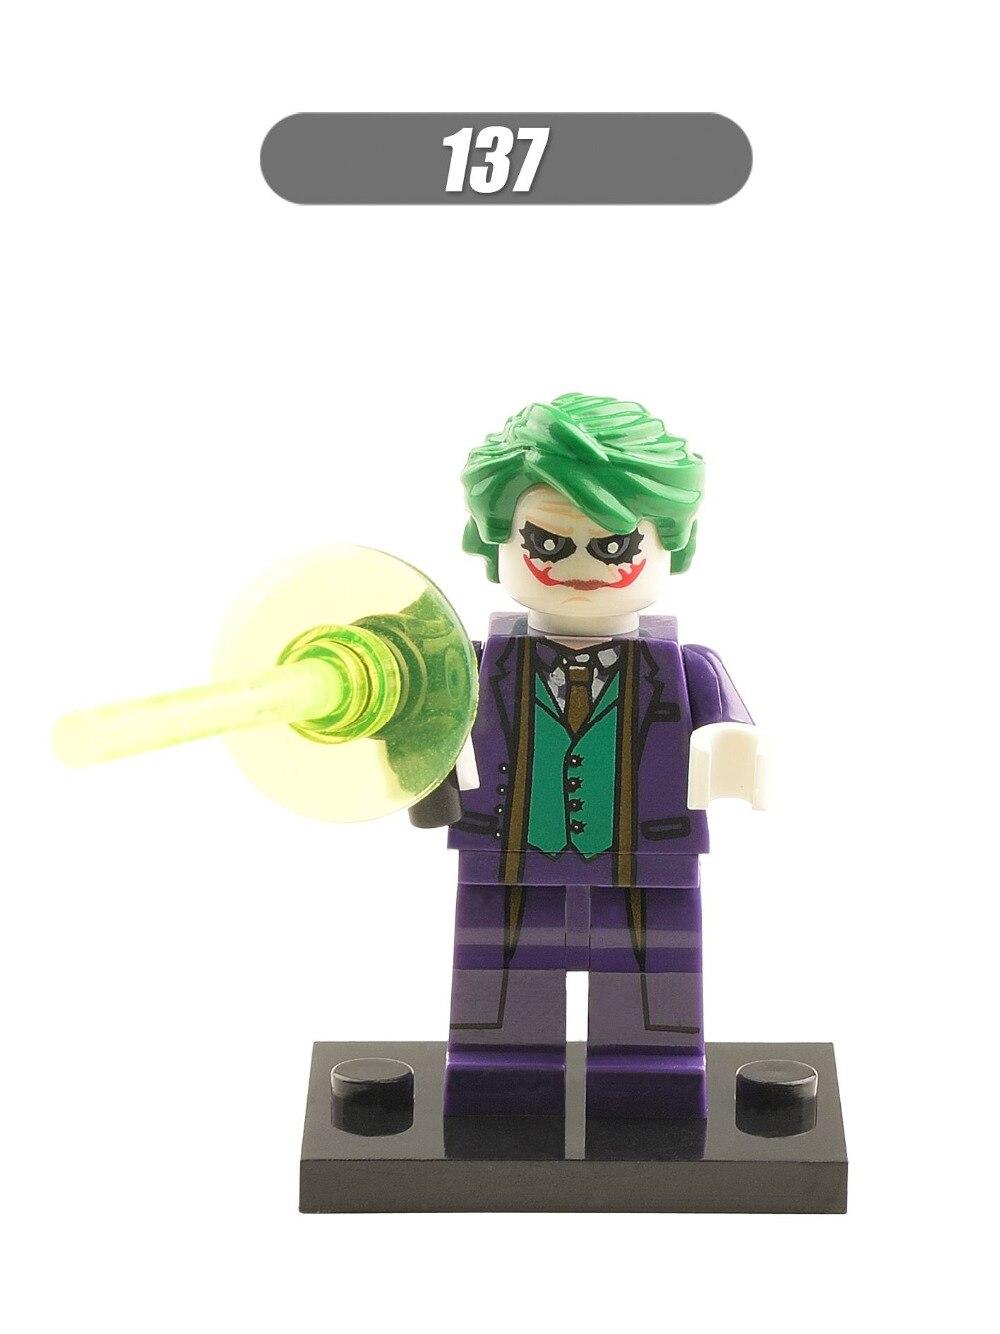 20Pcs Building Blocks Super Heroes Joker Venom Cyclops Doctor Doom Poison Ivy Batman Bricks Assemble Children Gift Toys XH 137